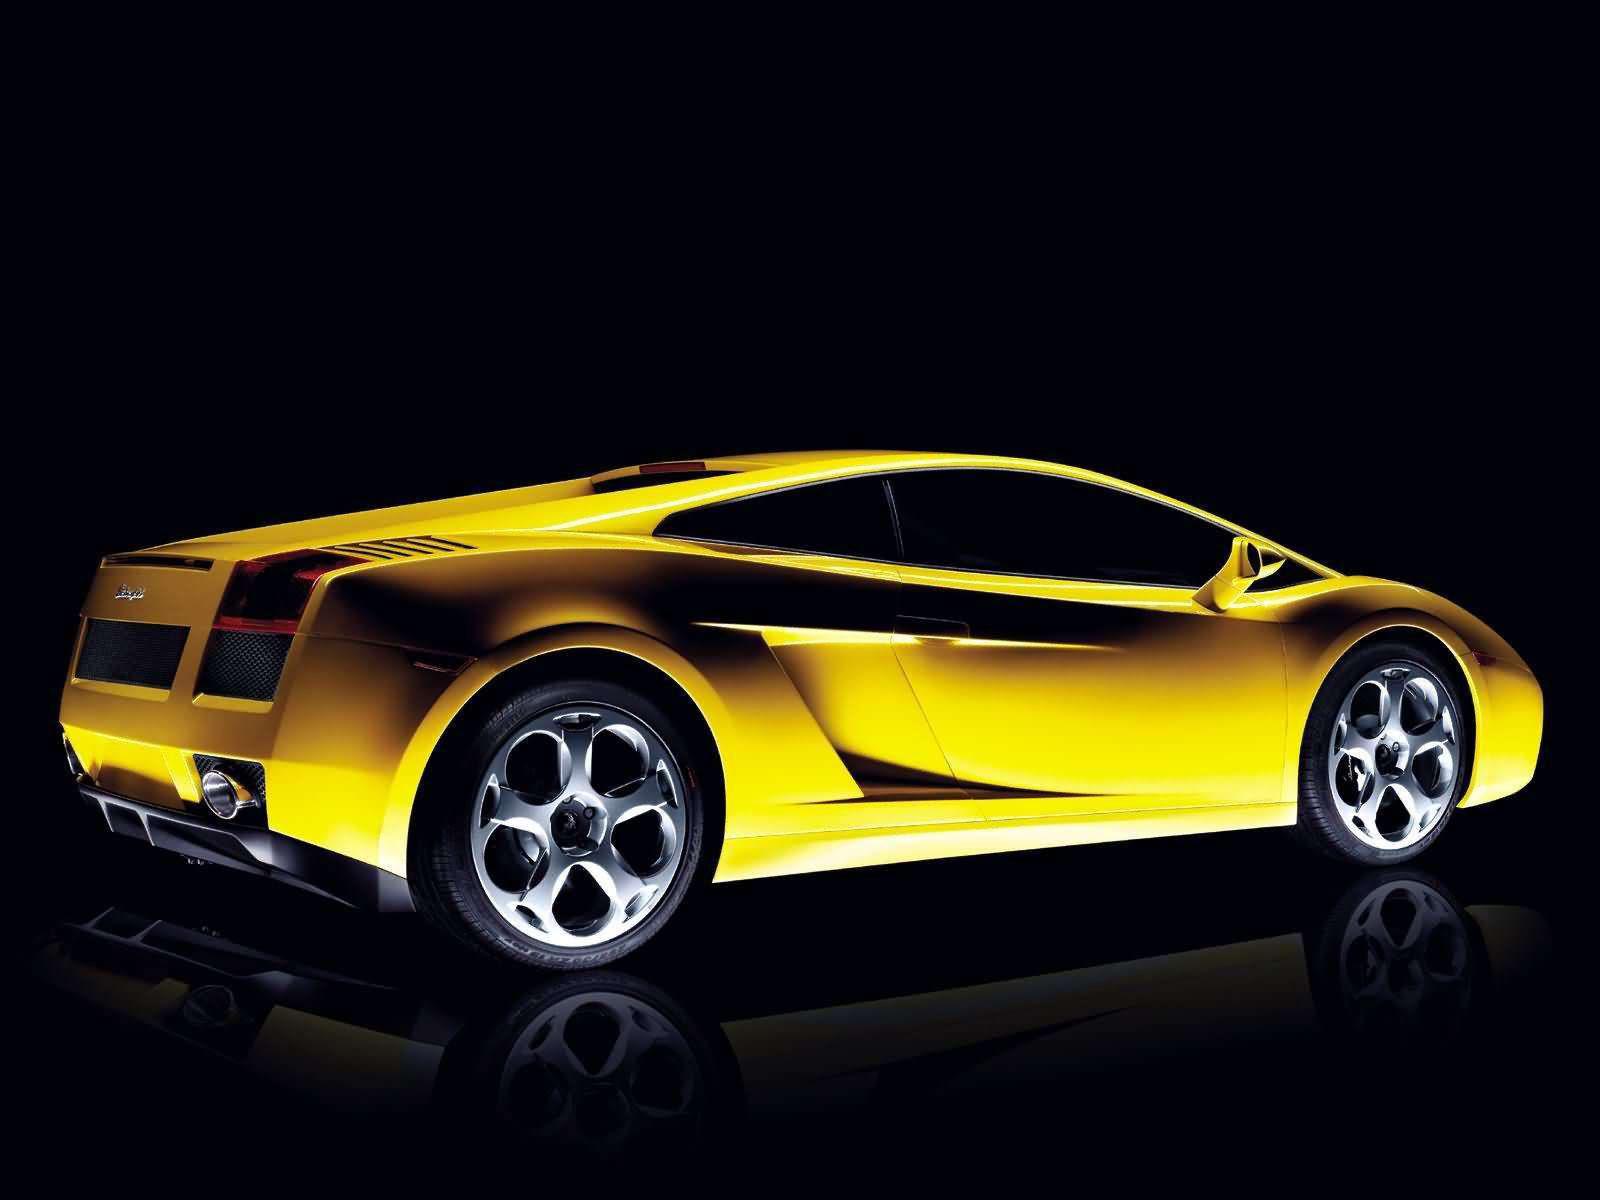 Lamborghini Wallpapers 2003 Lamborghini Gallardo Accident